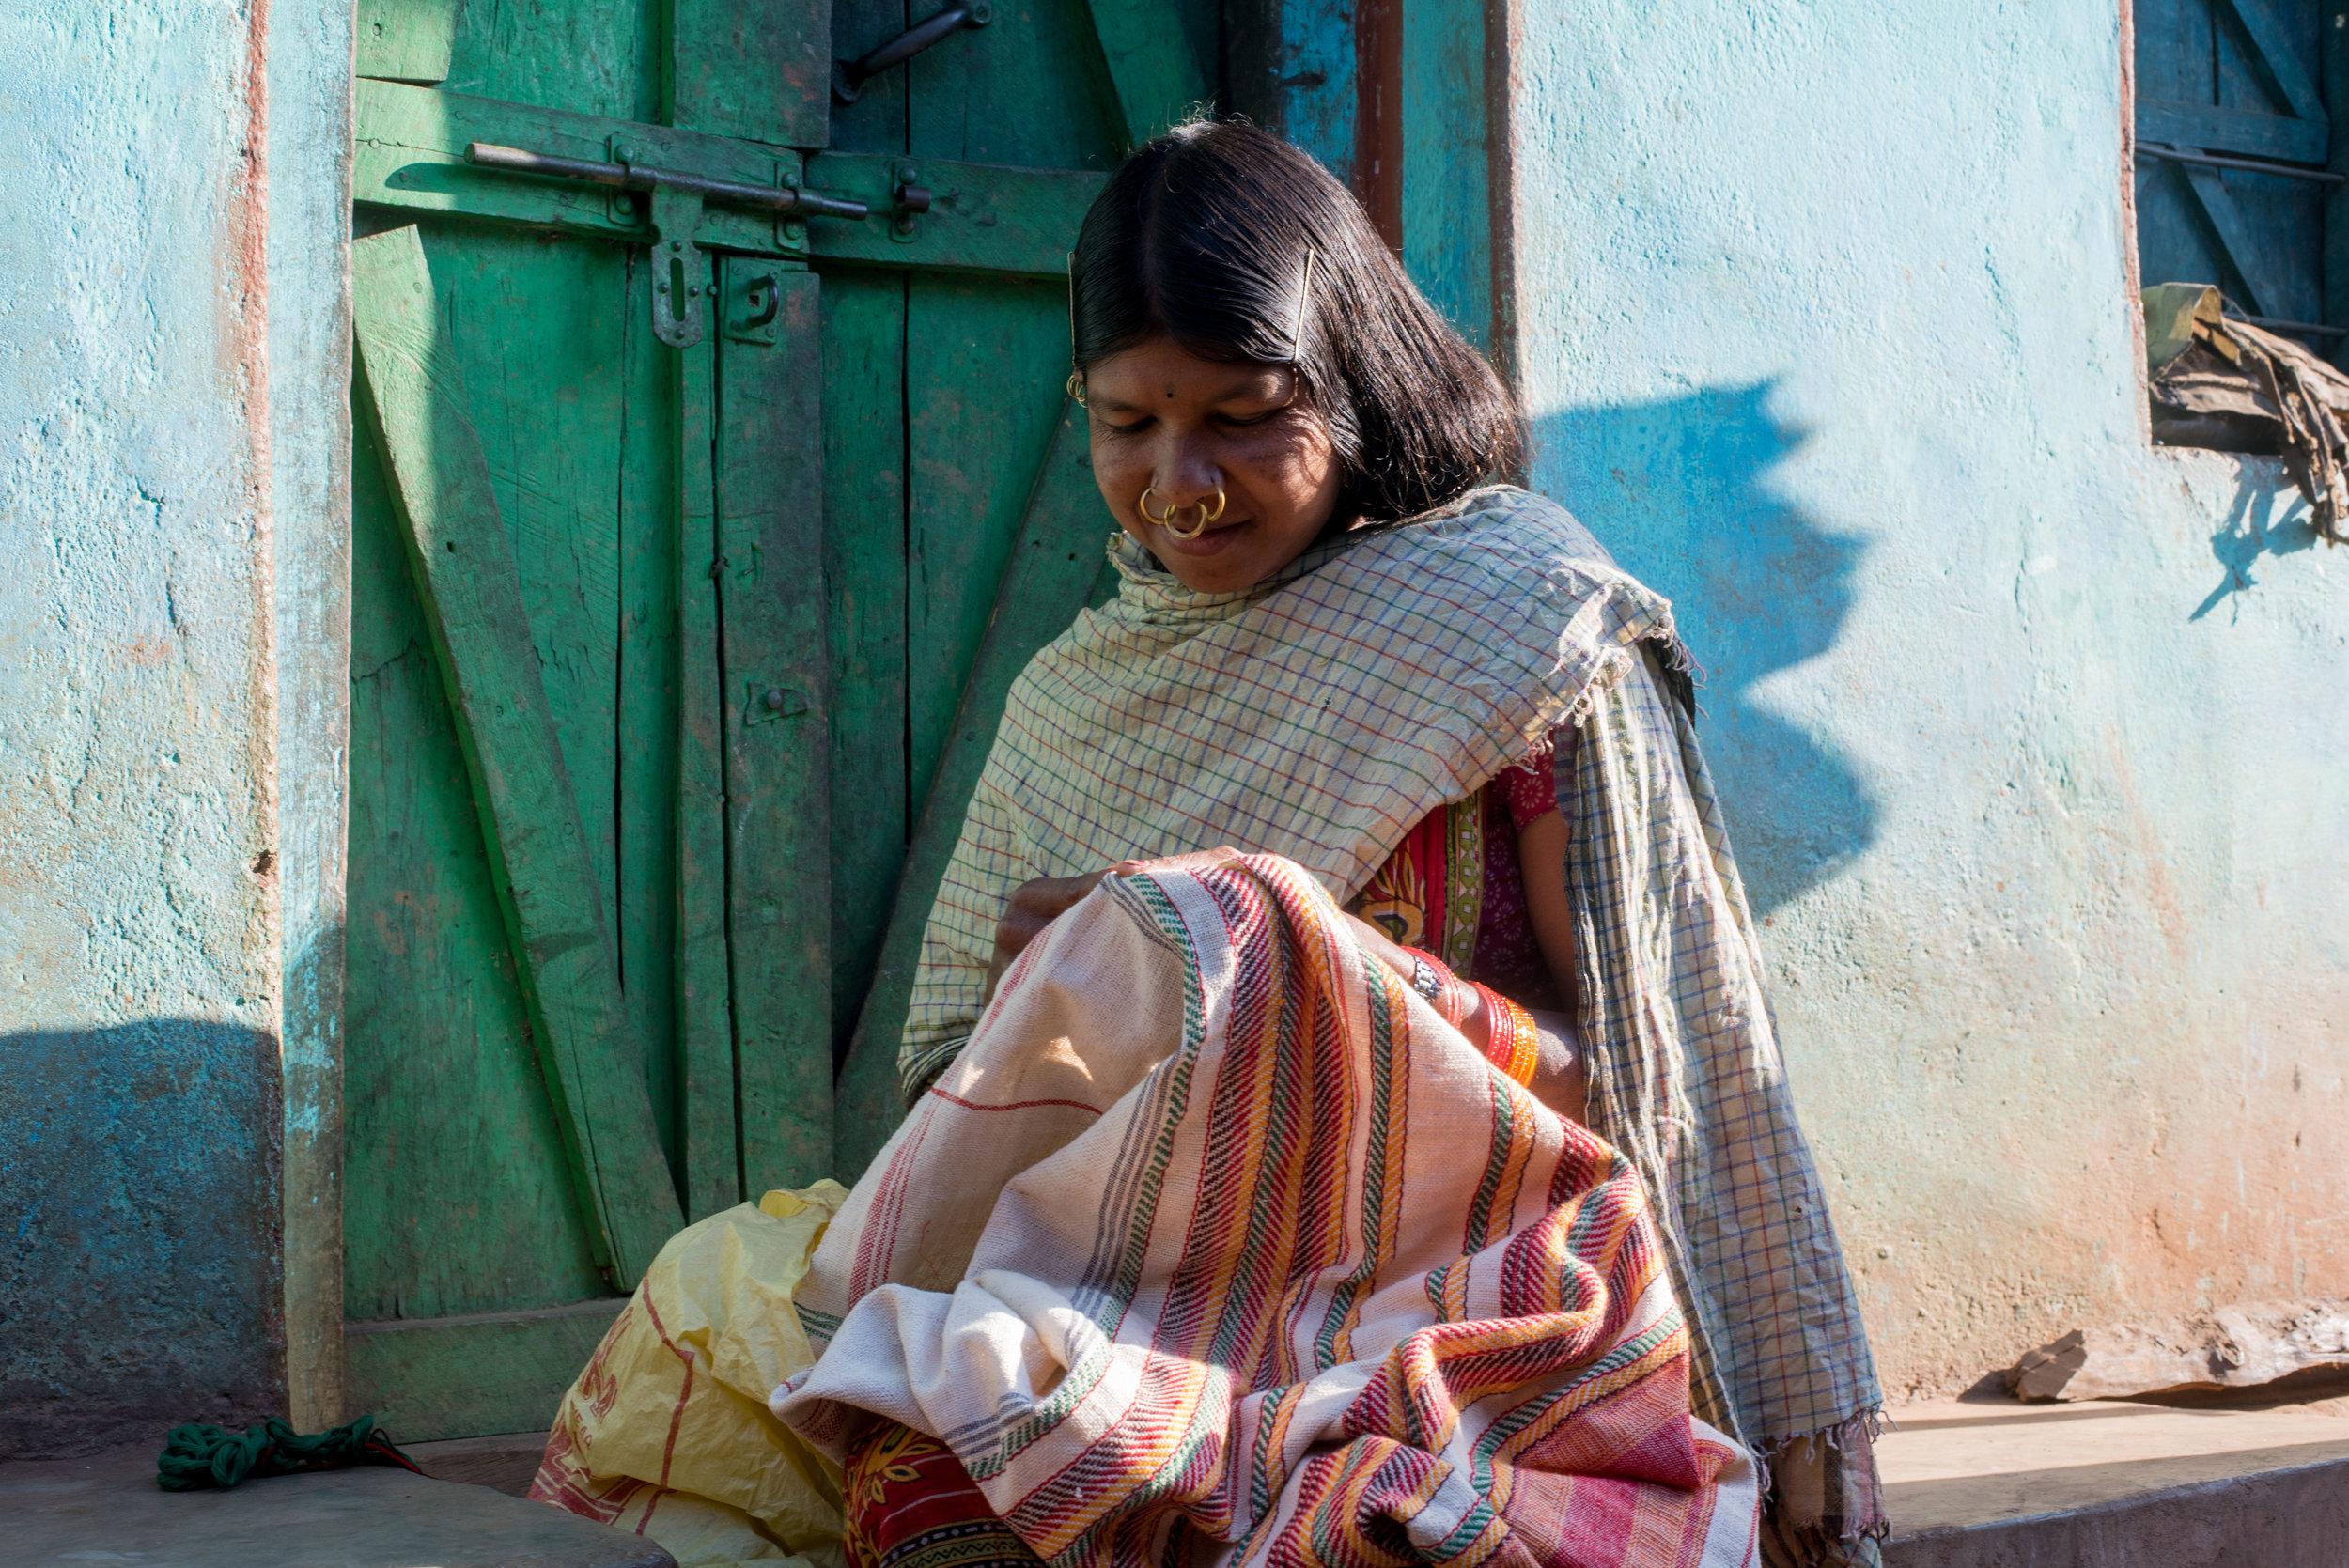 Dongria girl embroidering their traditional textile, 'Kapadagonda'.